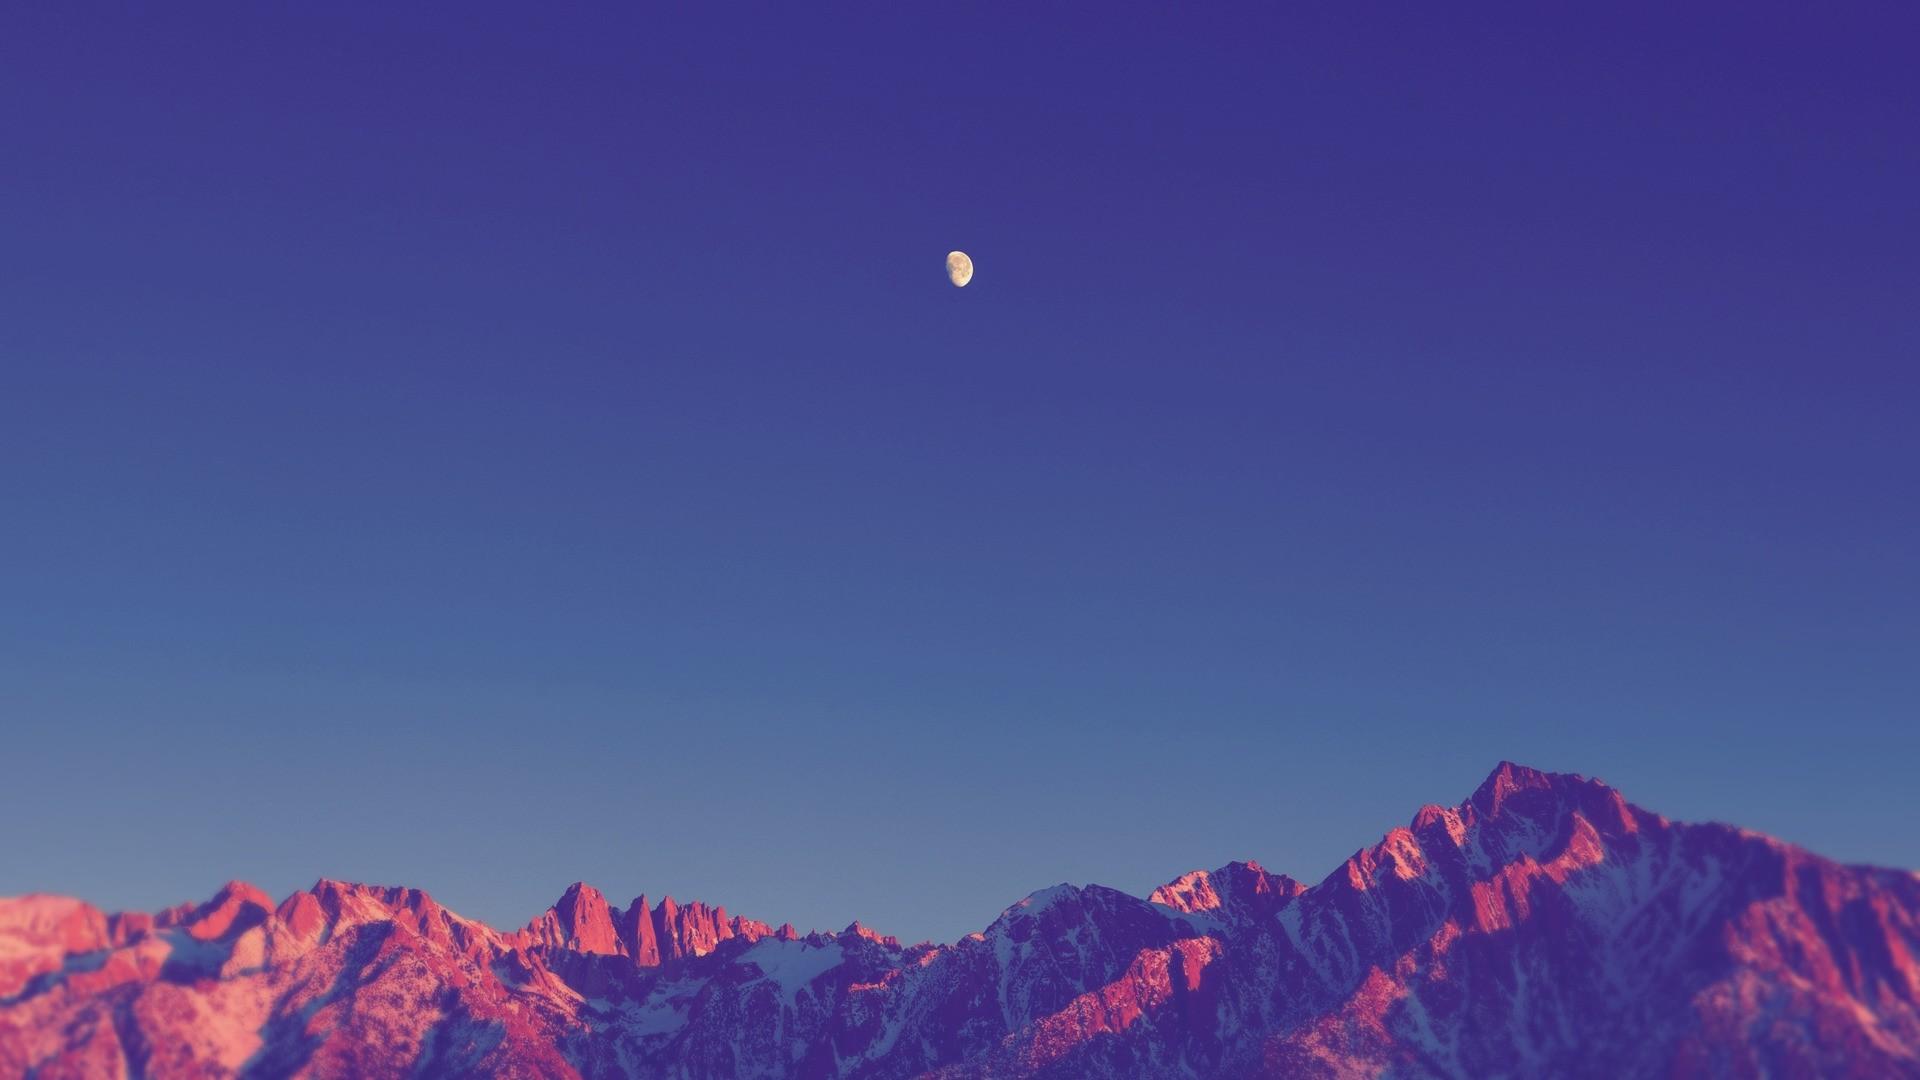 Sky Minimalist Background Wallpaper